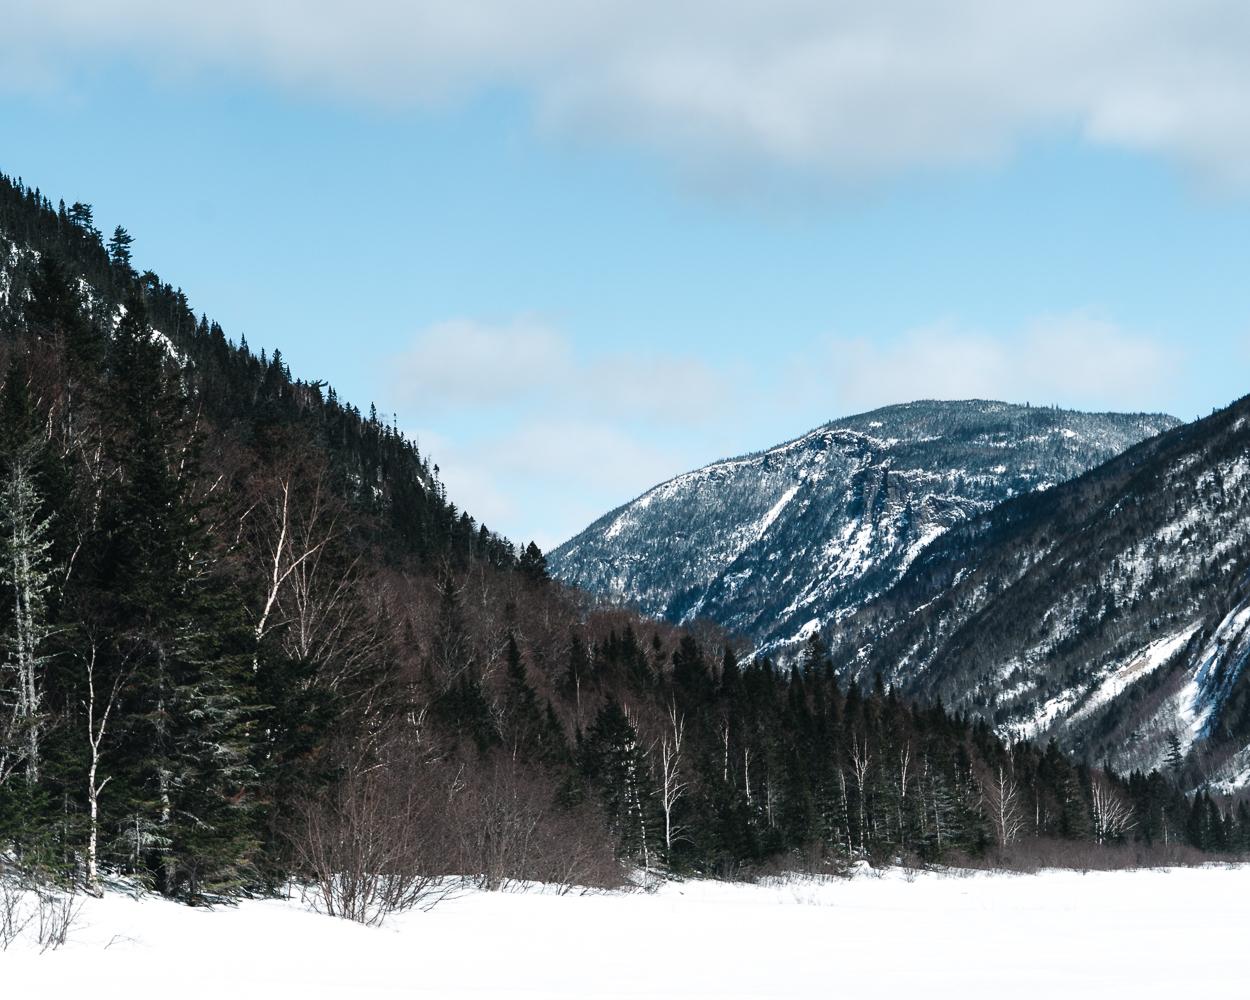 Winter of Québec - Anthony Ledoux - Photographer and Filmmaker - Photographe13.jpg